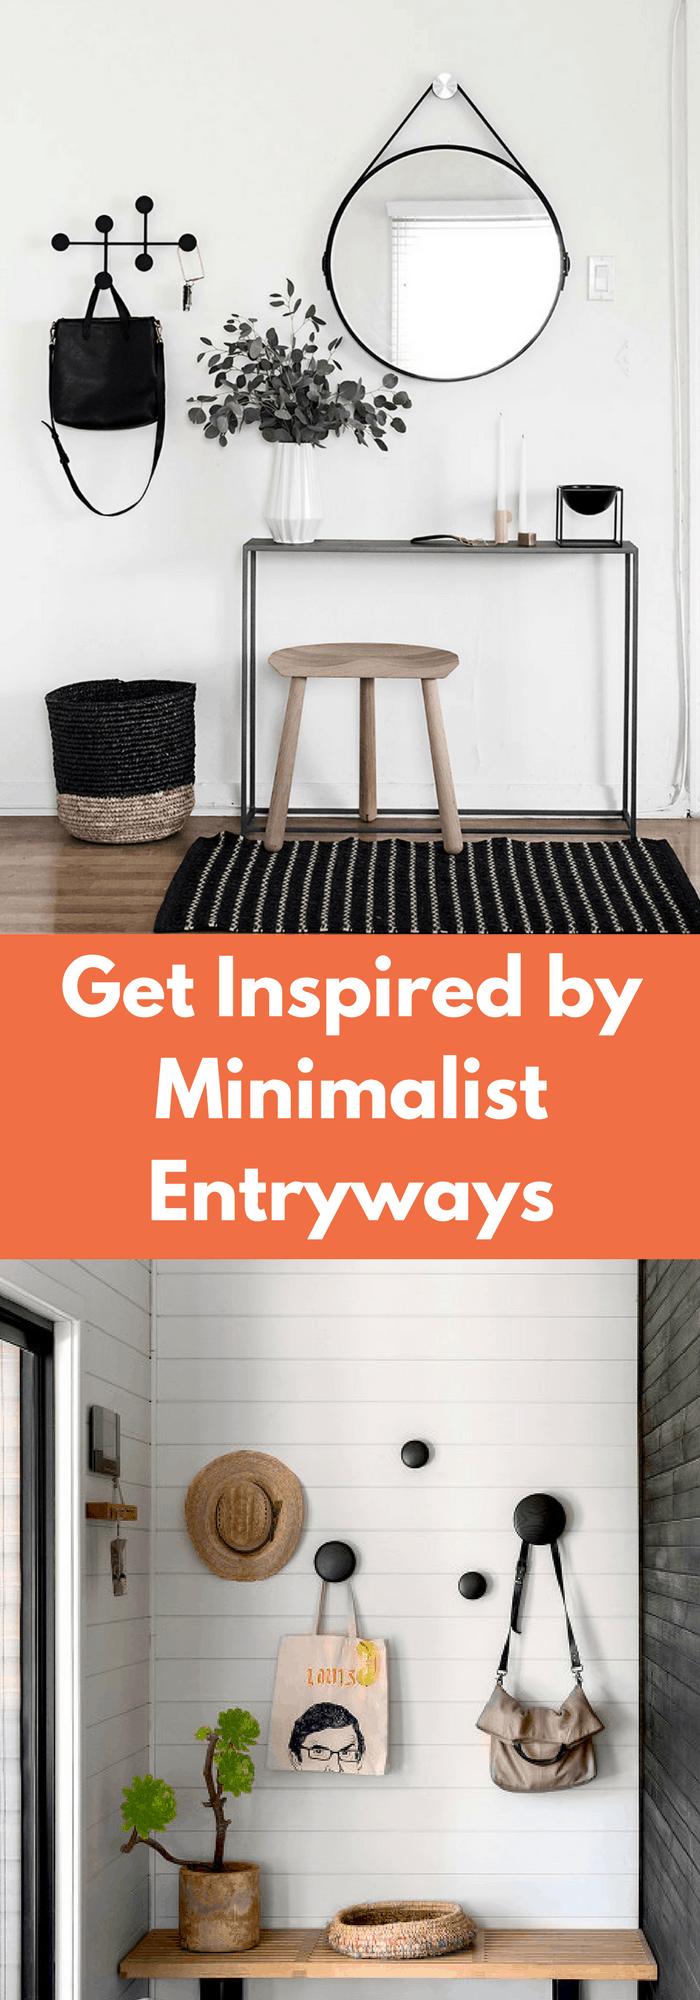 Foyer Minimalist Art : Get inspired by these minimalist entryways the